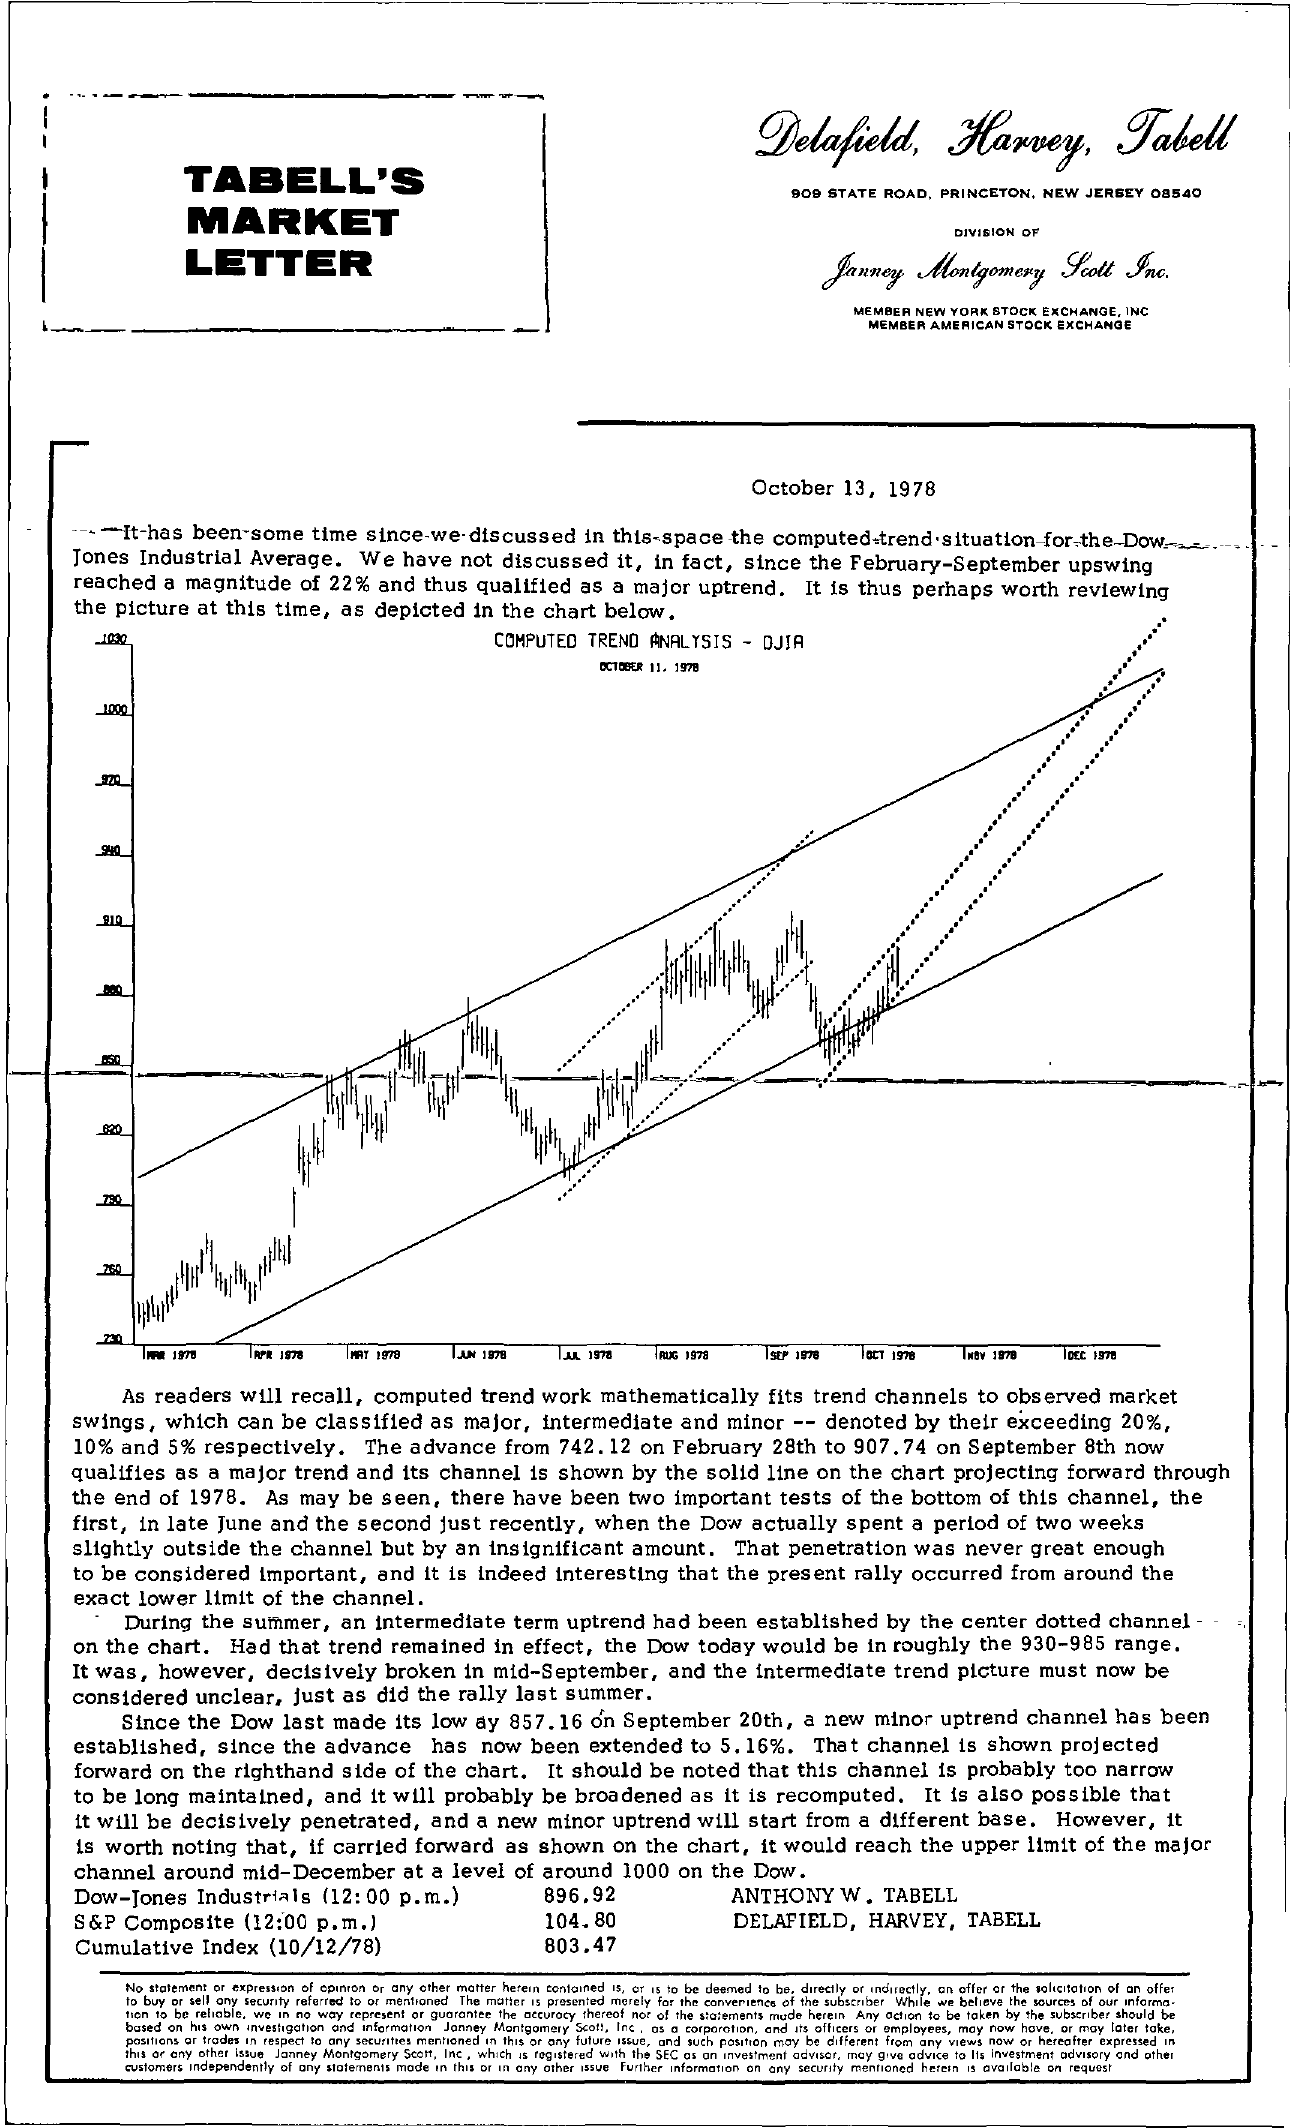 Tabell's Market Letter - October 13, 1978